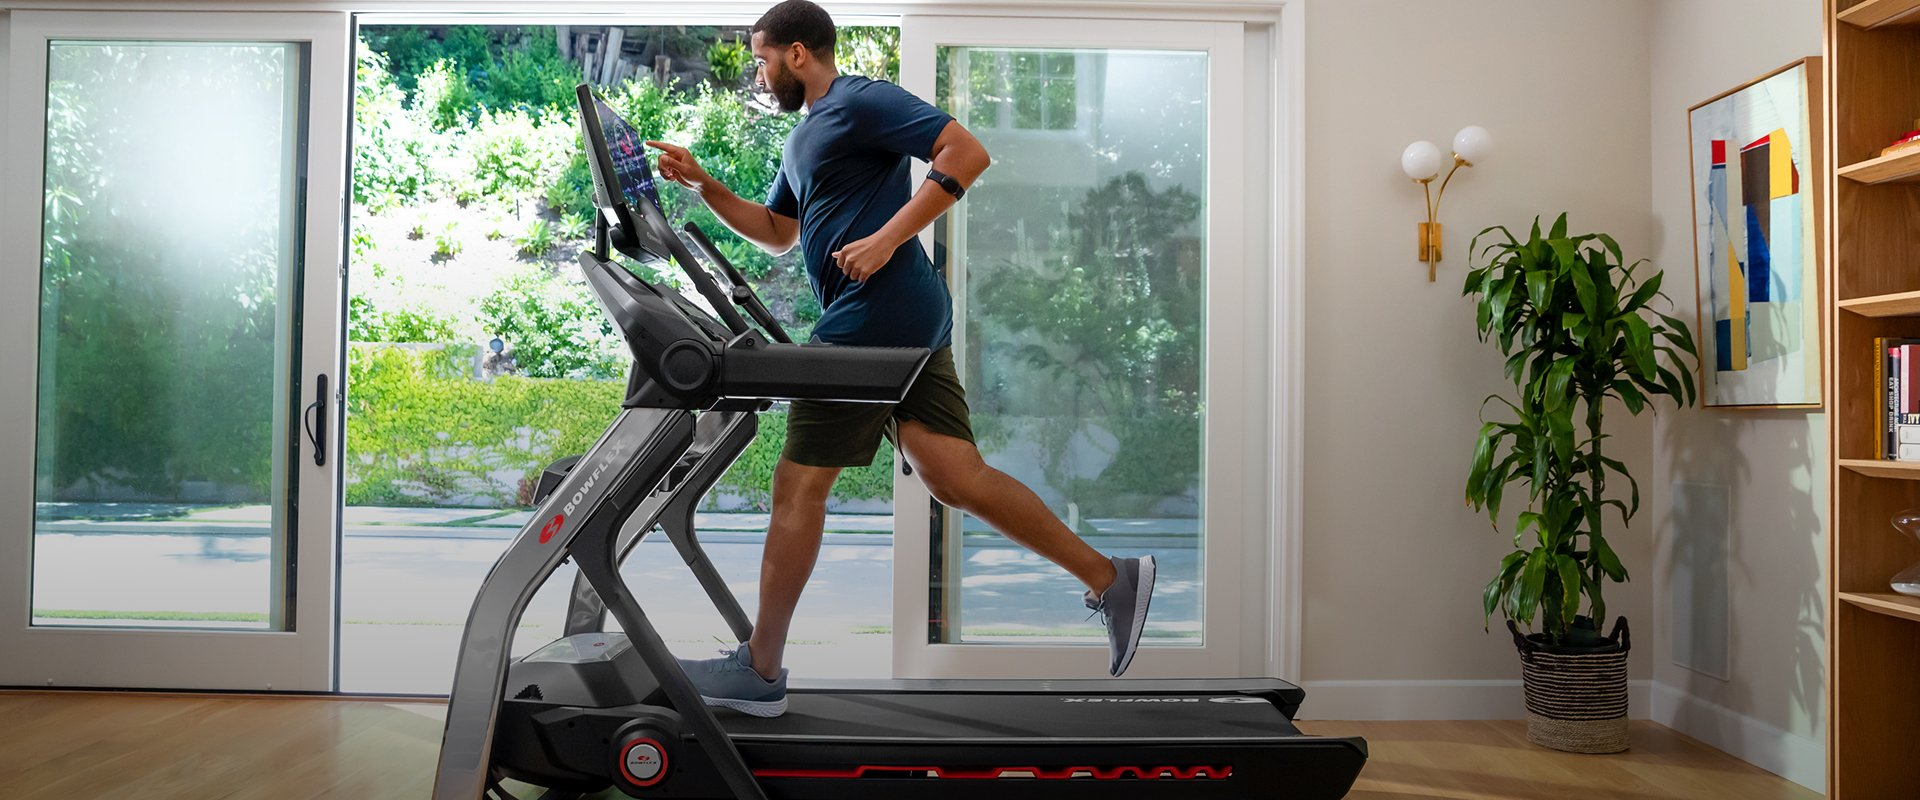 Man using a Bowflex treadmill.